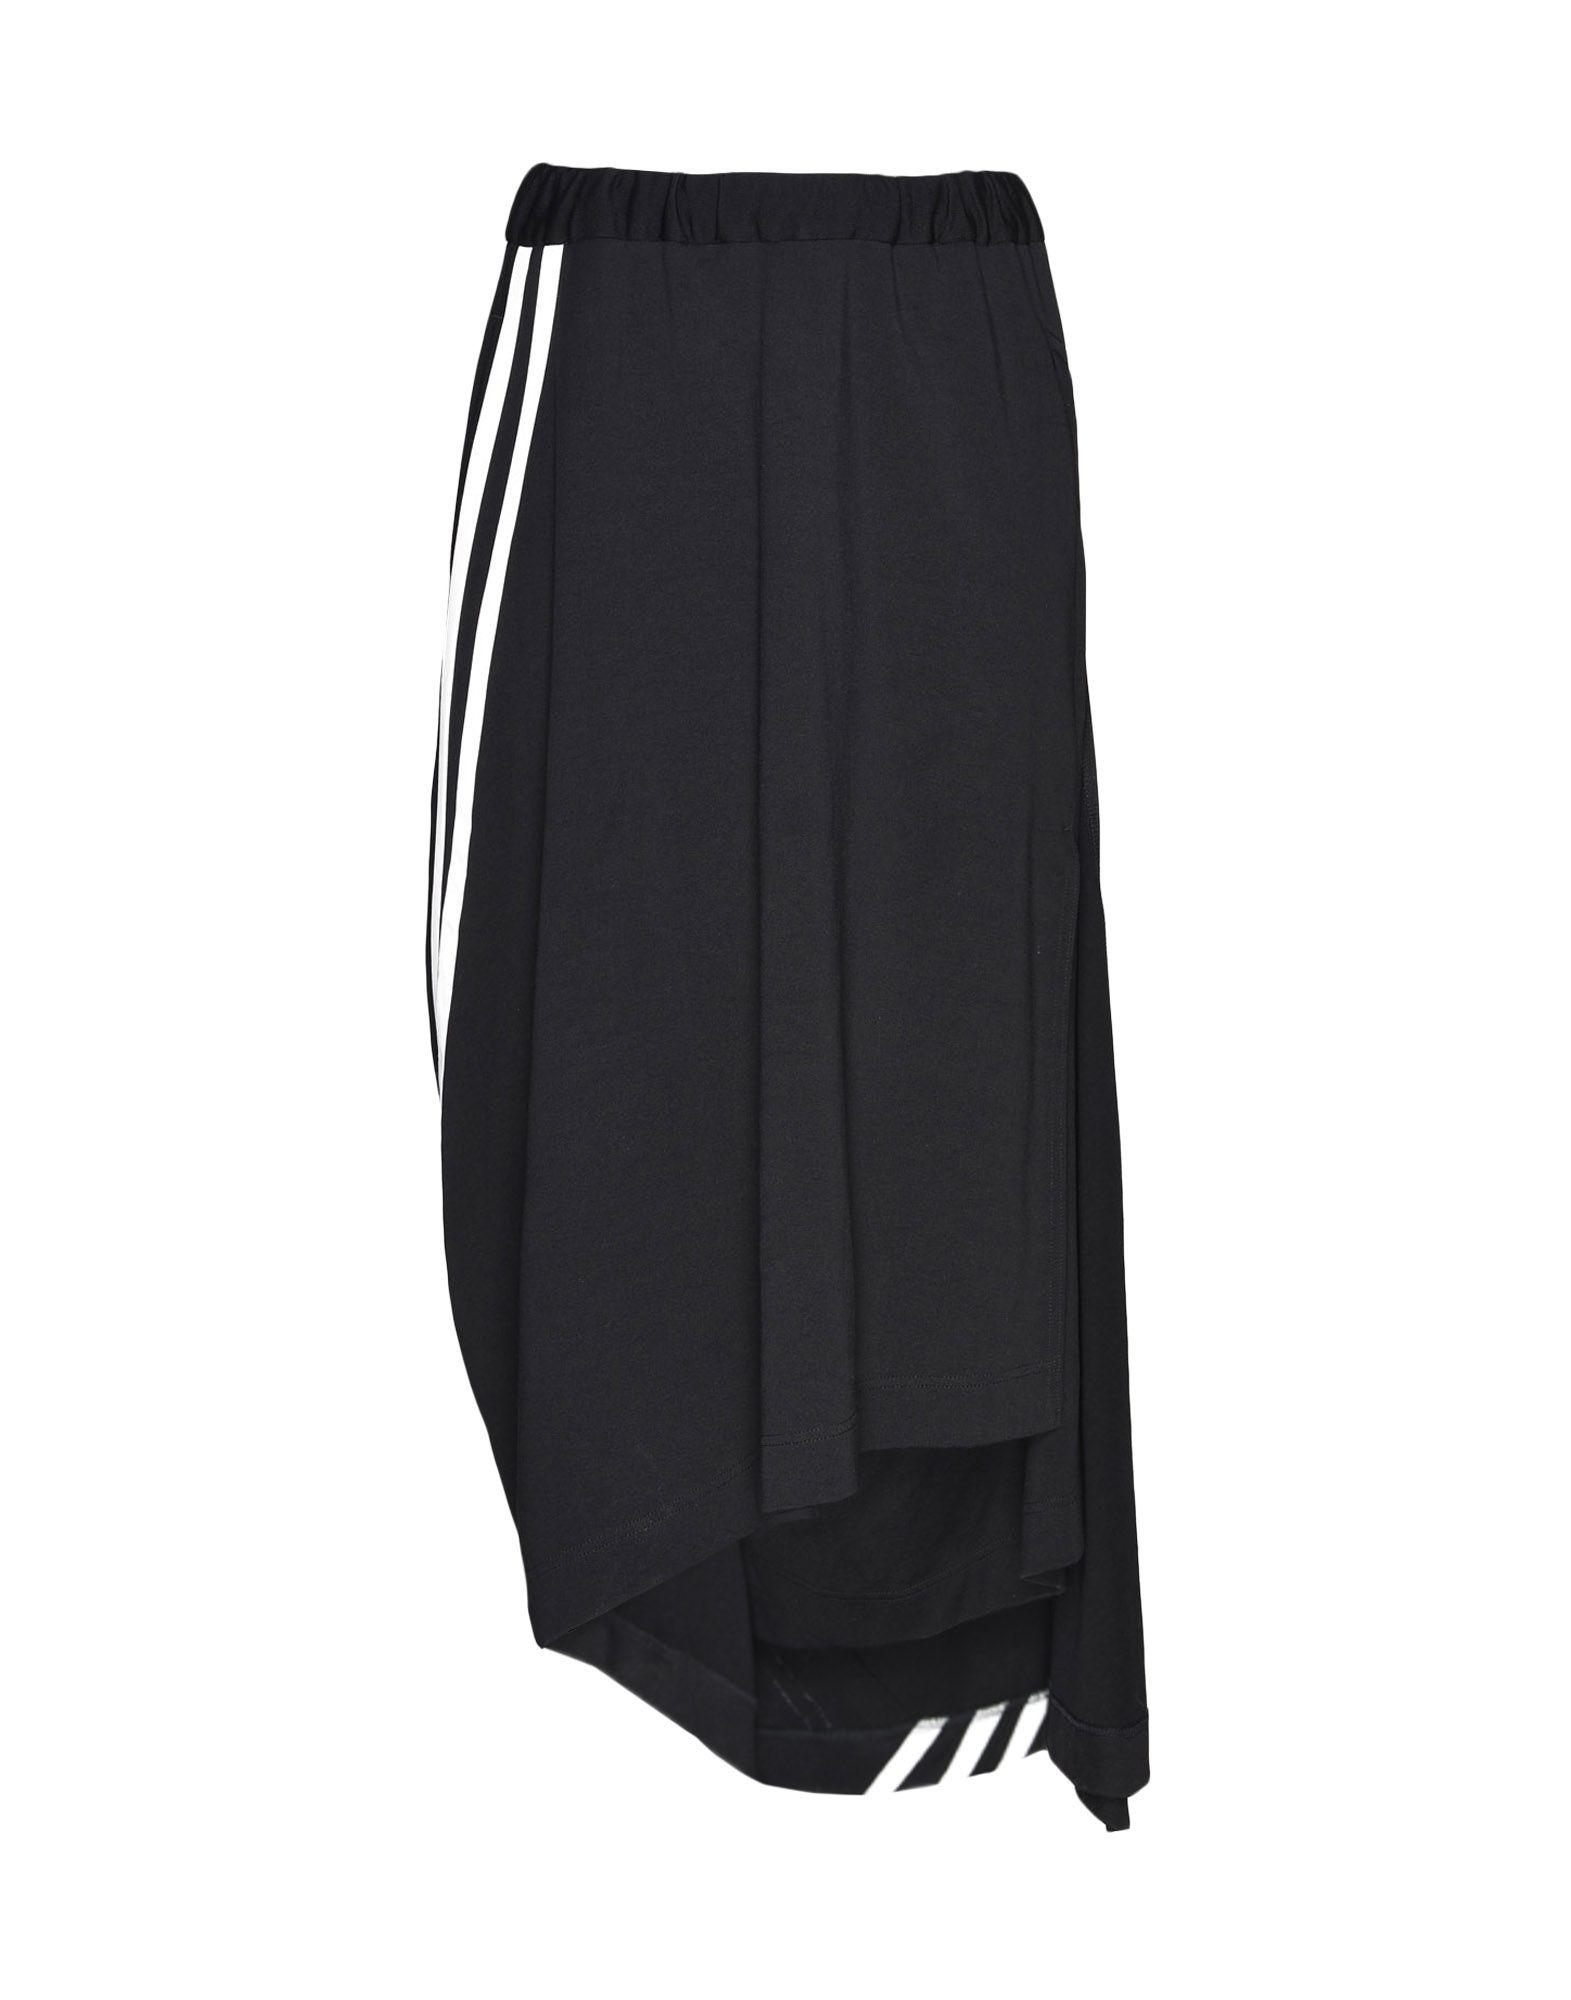 Y-3 Y-3 3-Stripes Drape Skirt Knee length skirt Woman f